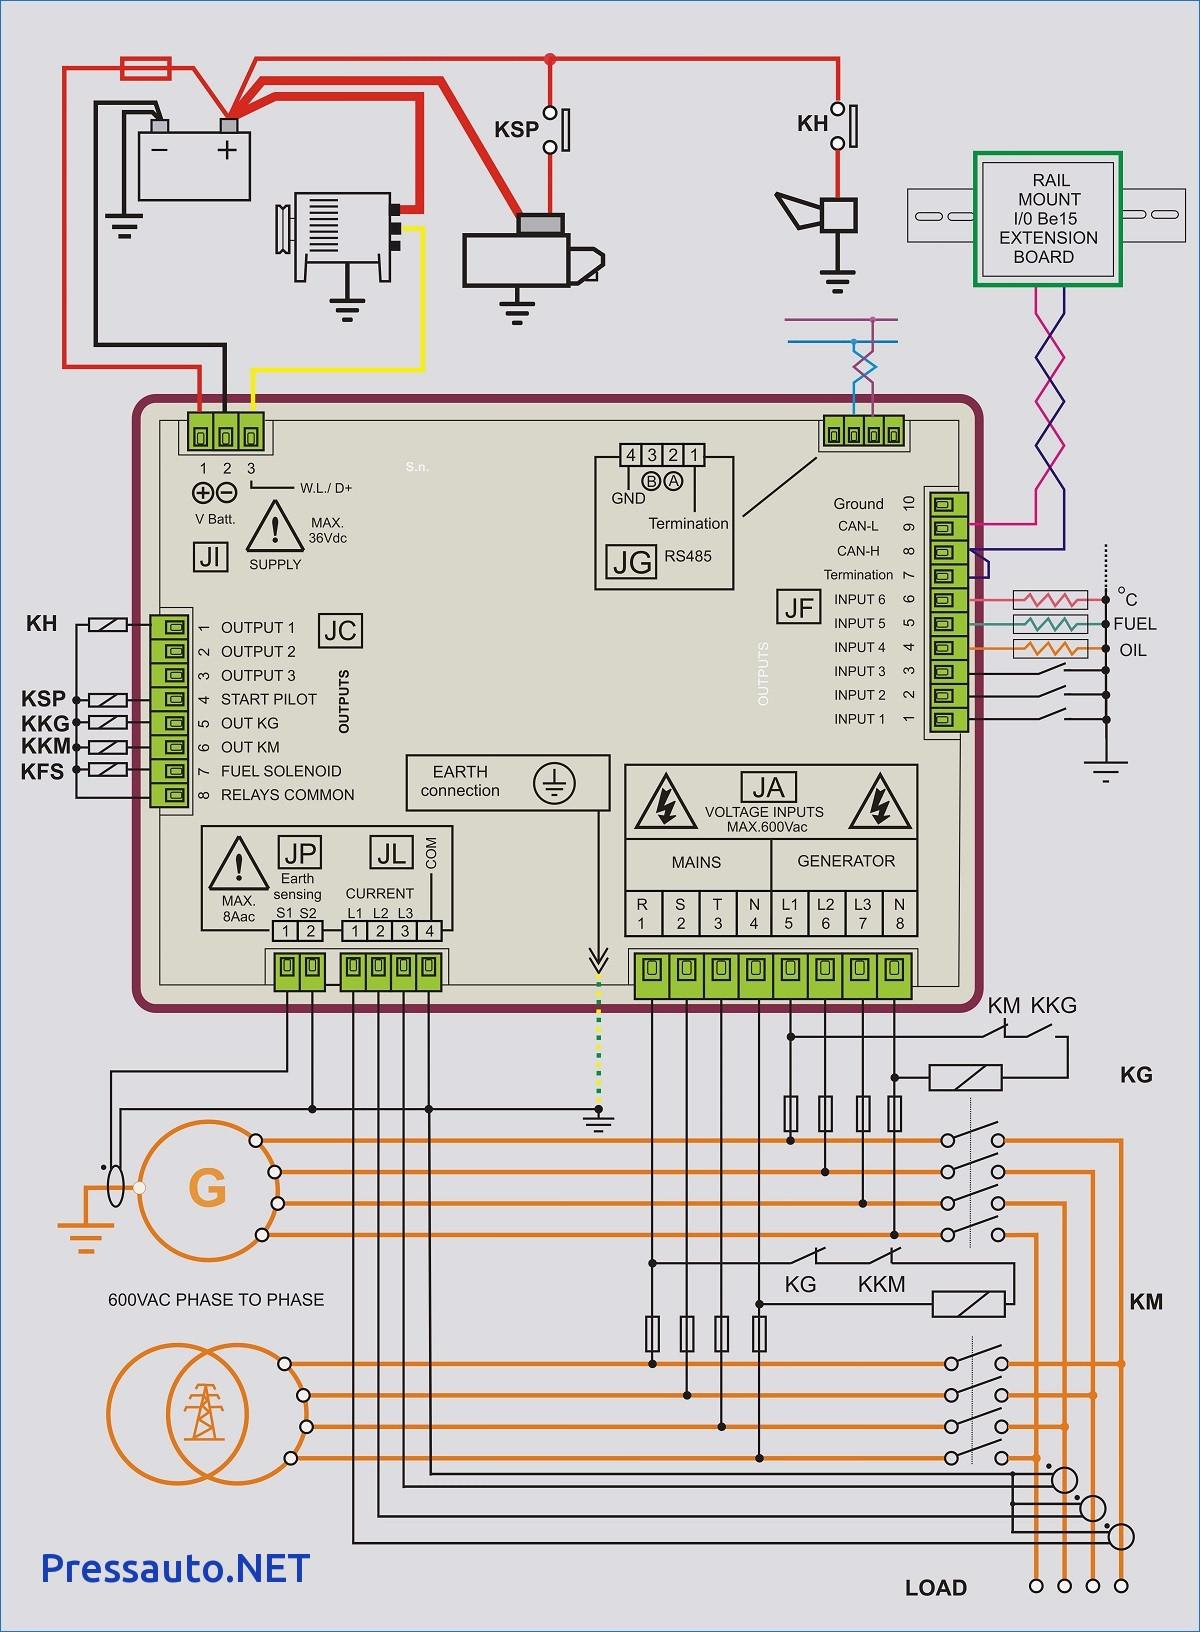 Generator Automatic Transfer Switch Wiring Diagram Generac With - Generator Automatic Transfer Switch Wiring Diagram